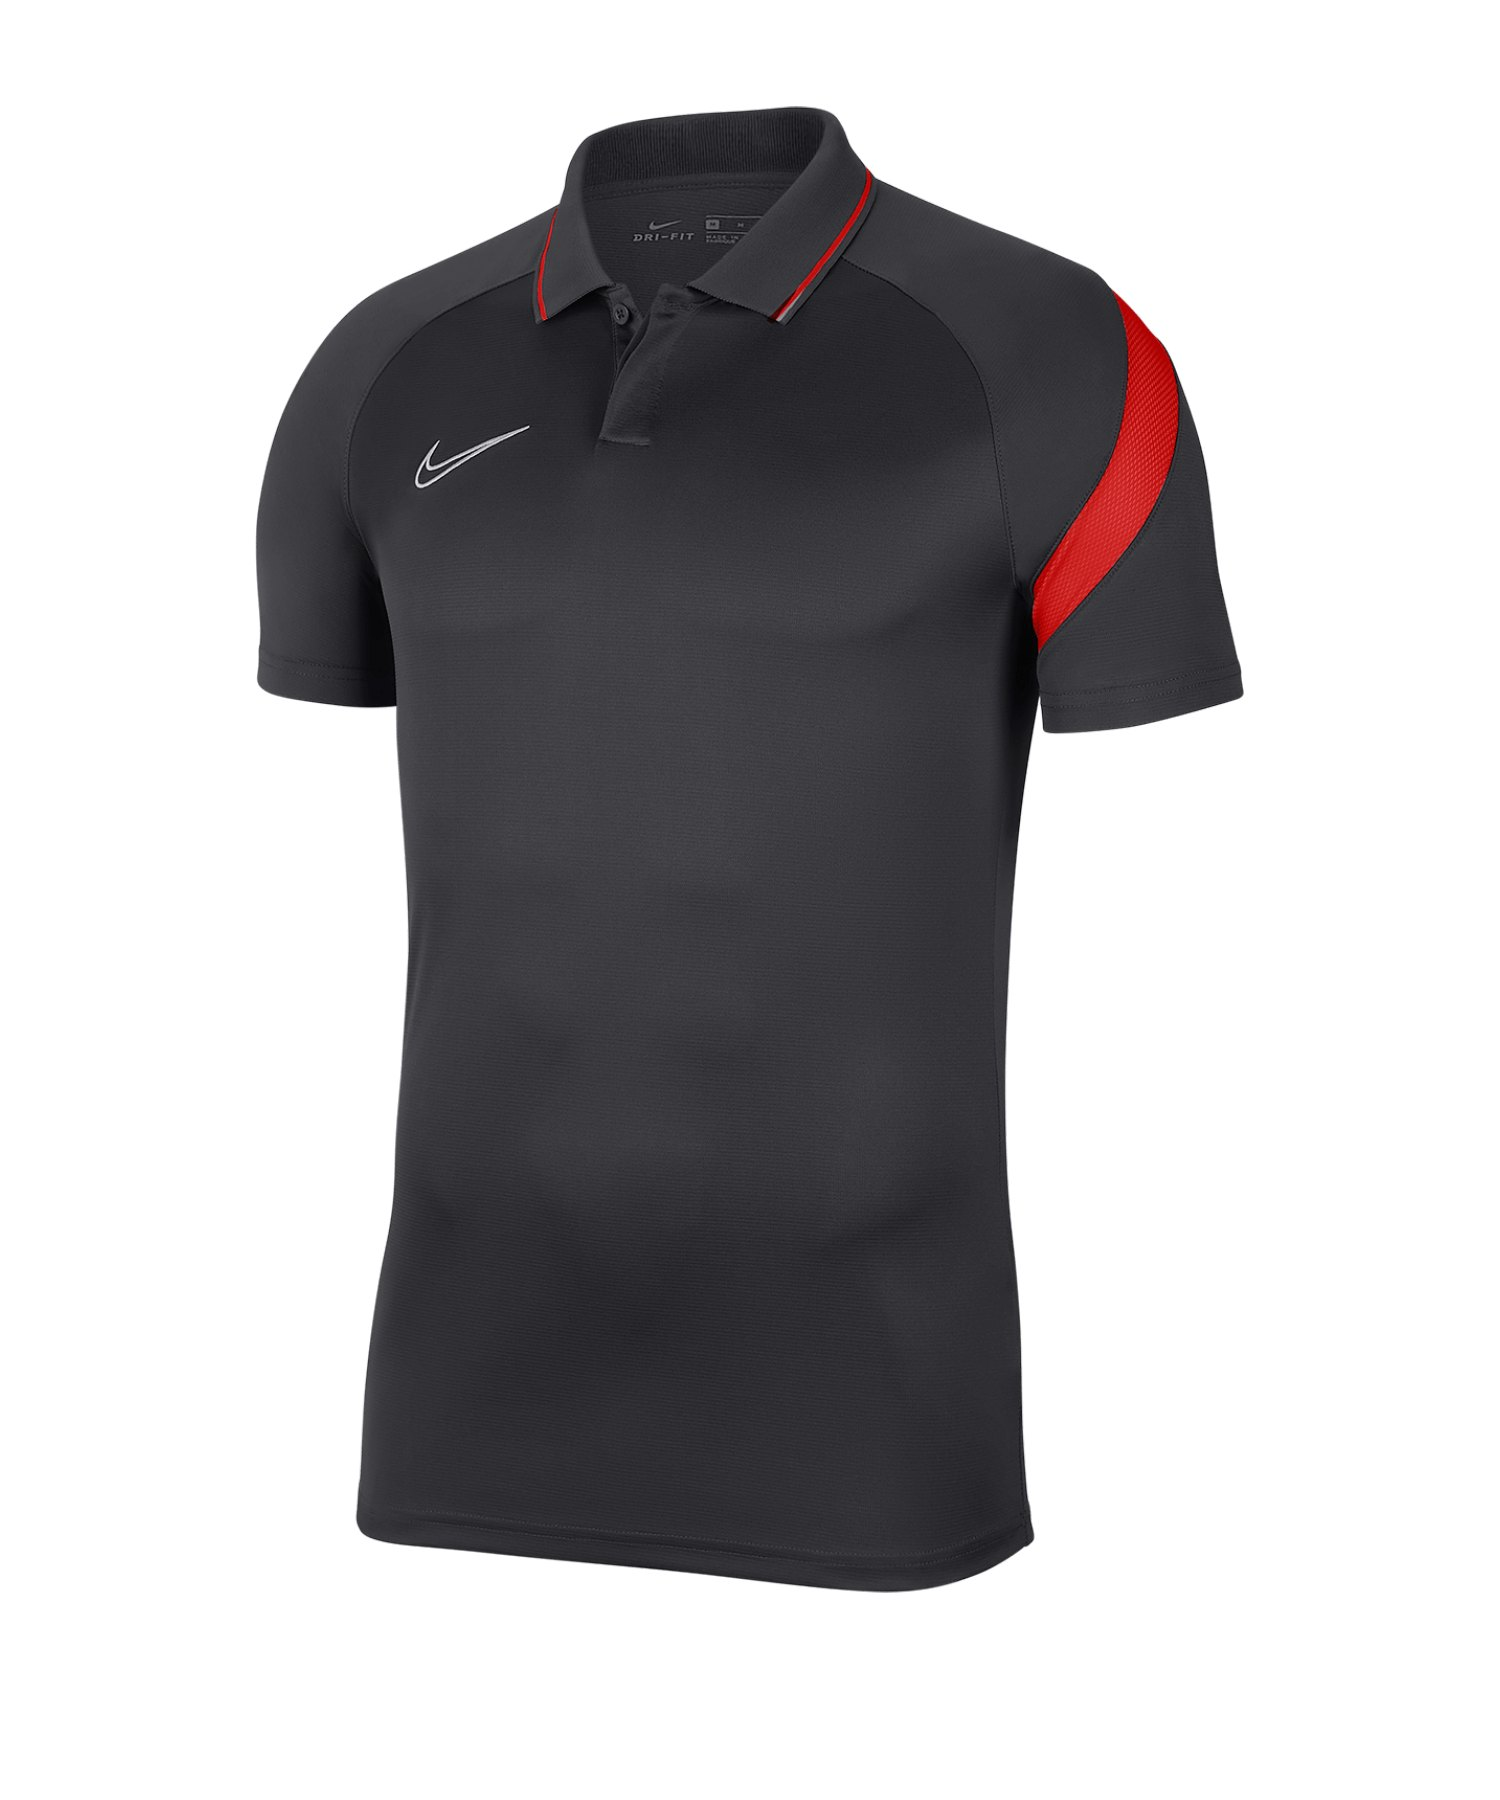 Nike Academy Pro Poloshirt Kids Grau Rot F068 - grau